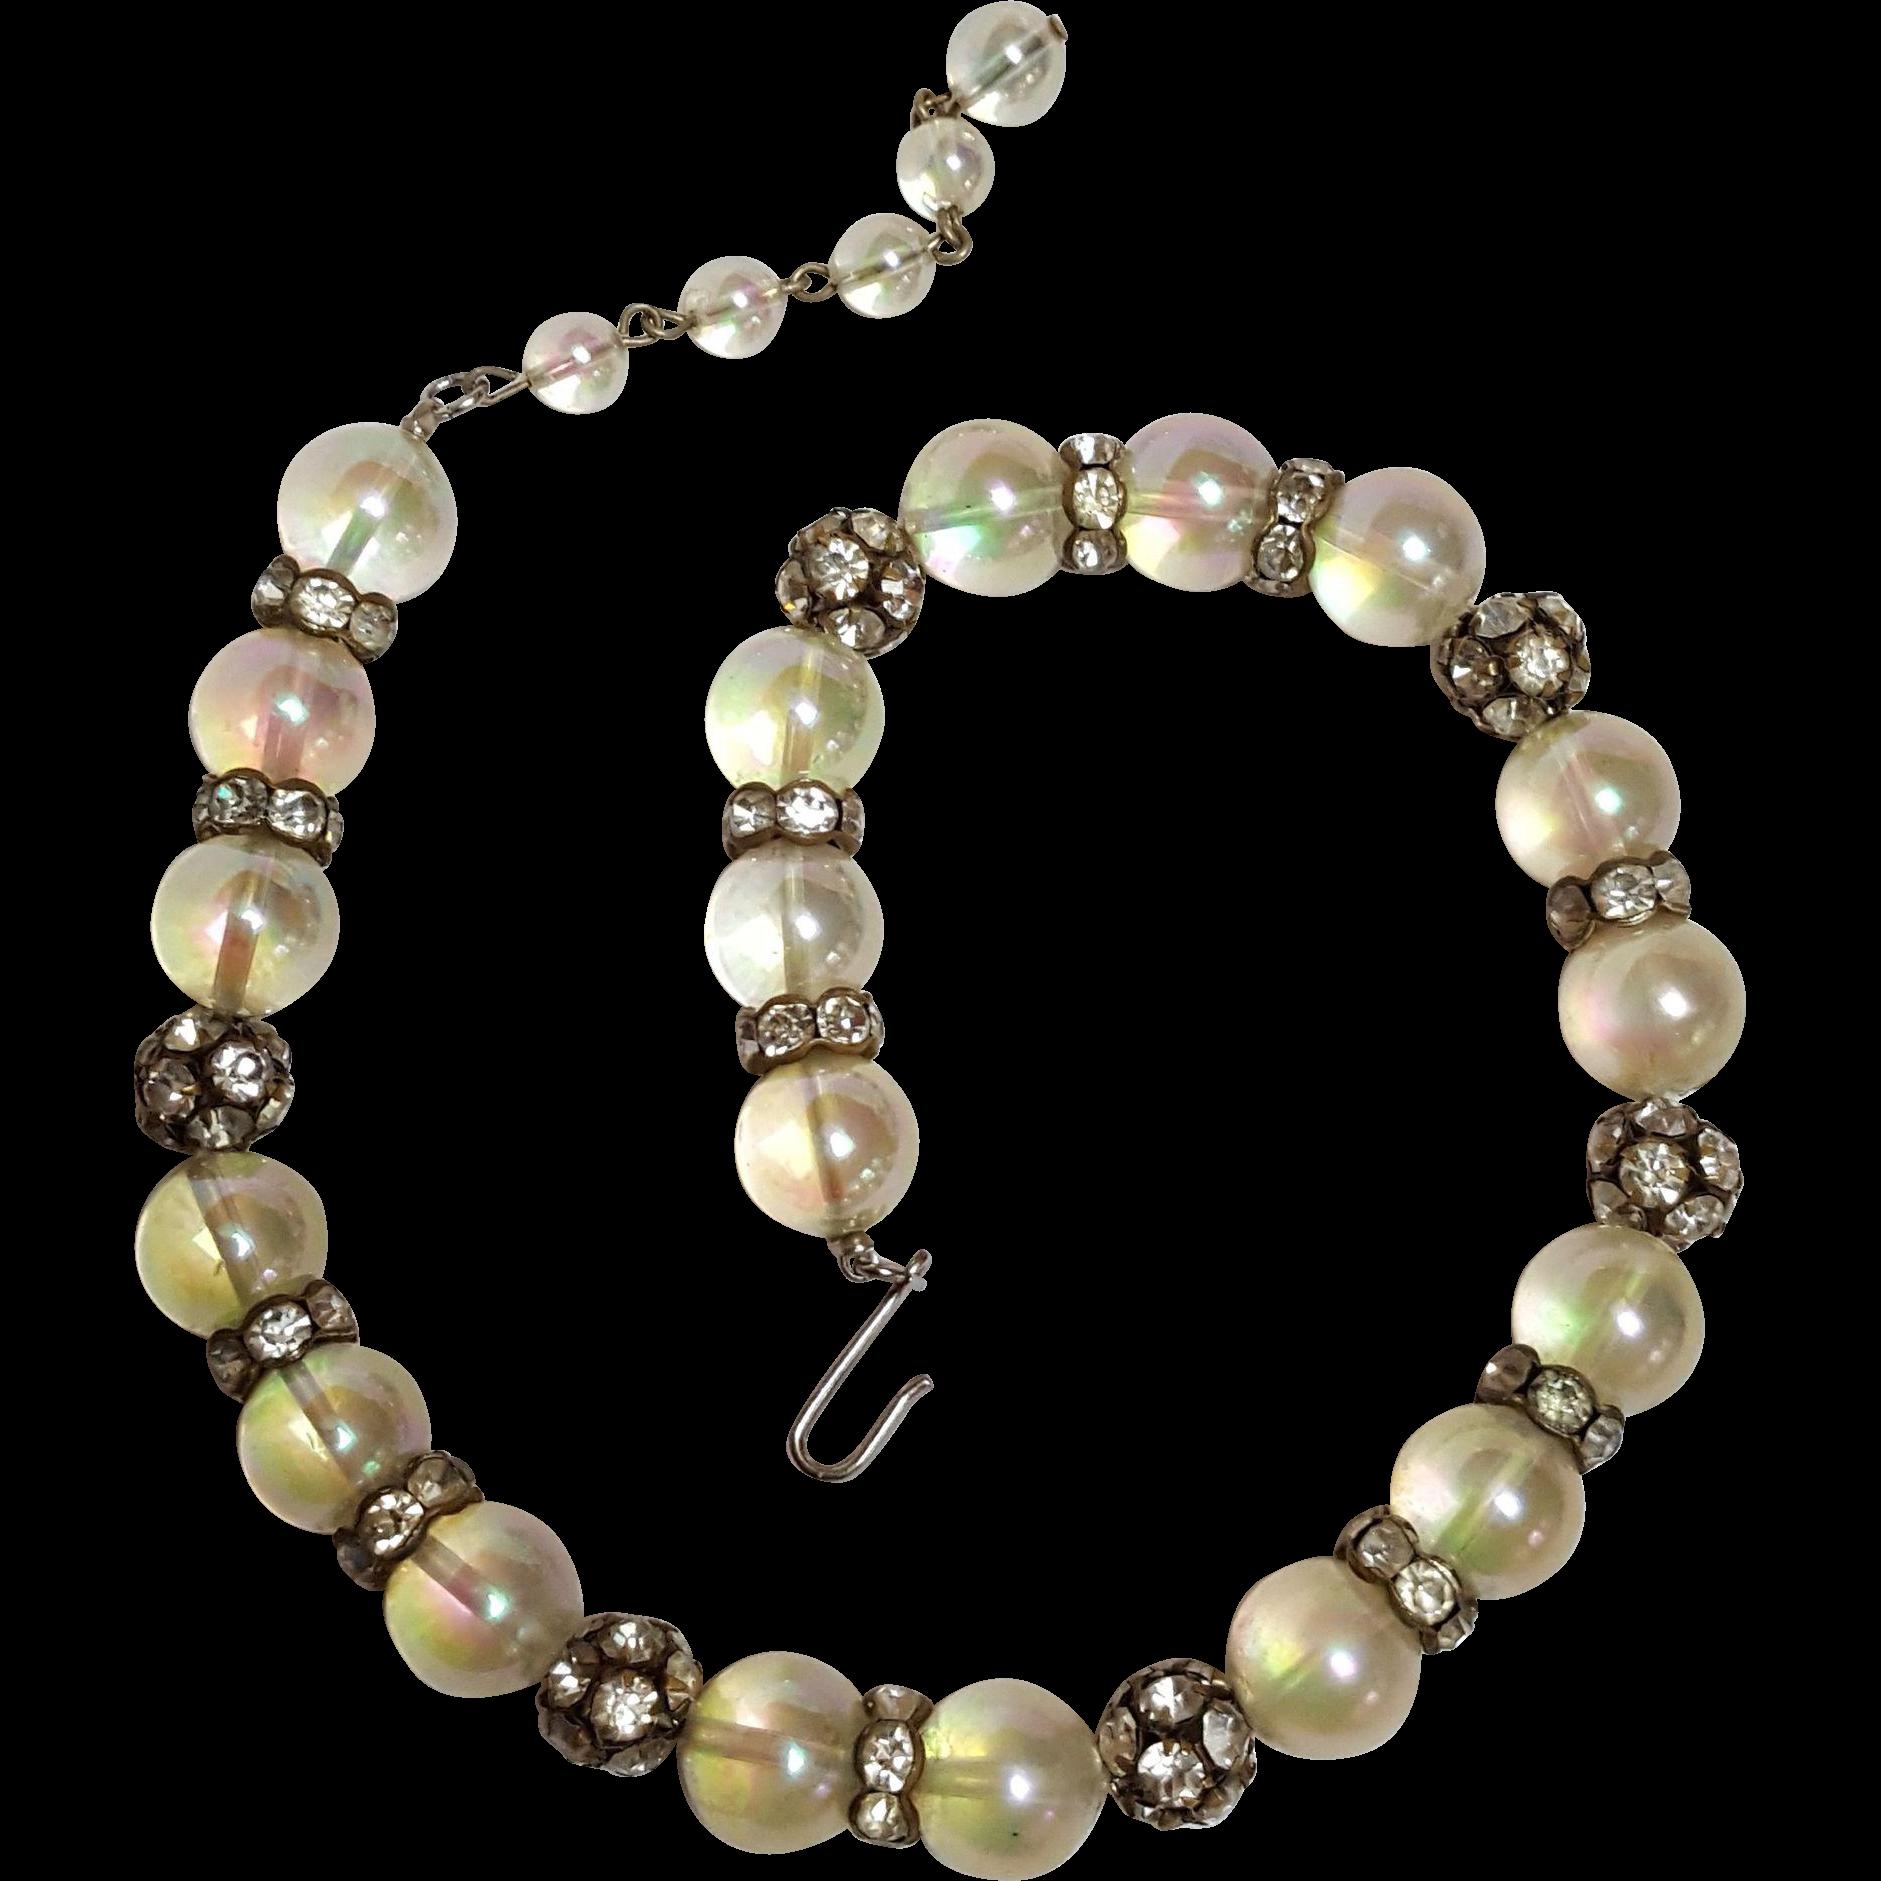 Iridescent lucite and rhinestone bead necklace